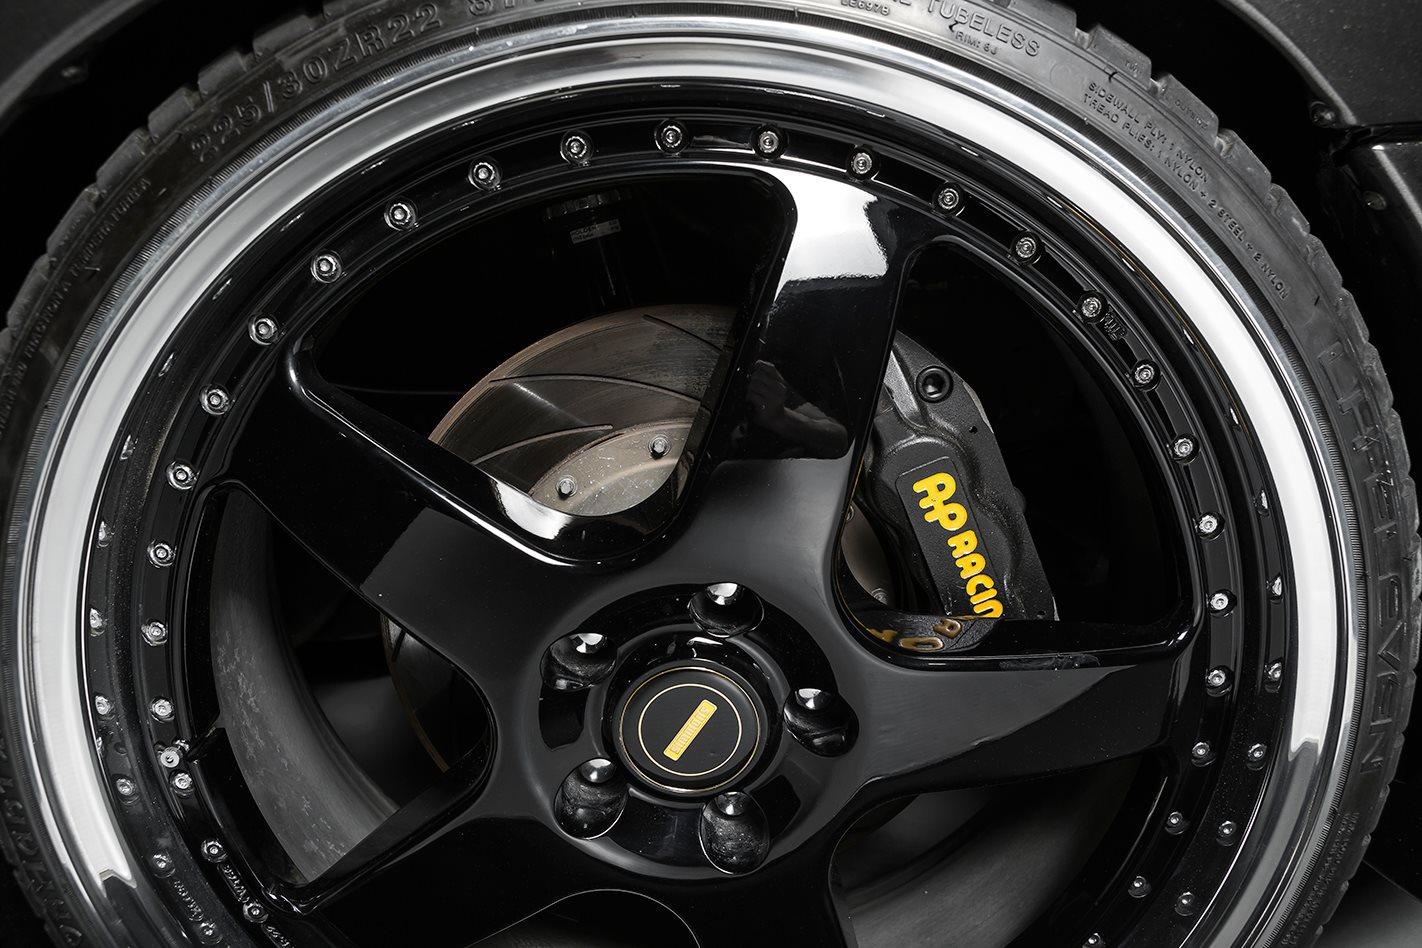 HSV Grange AP Racing brakes